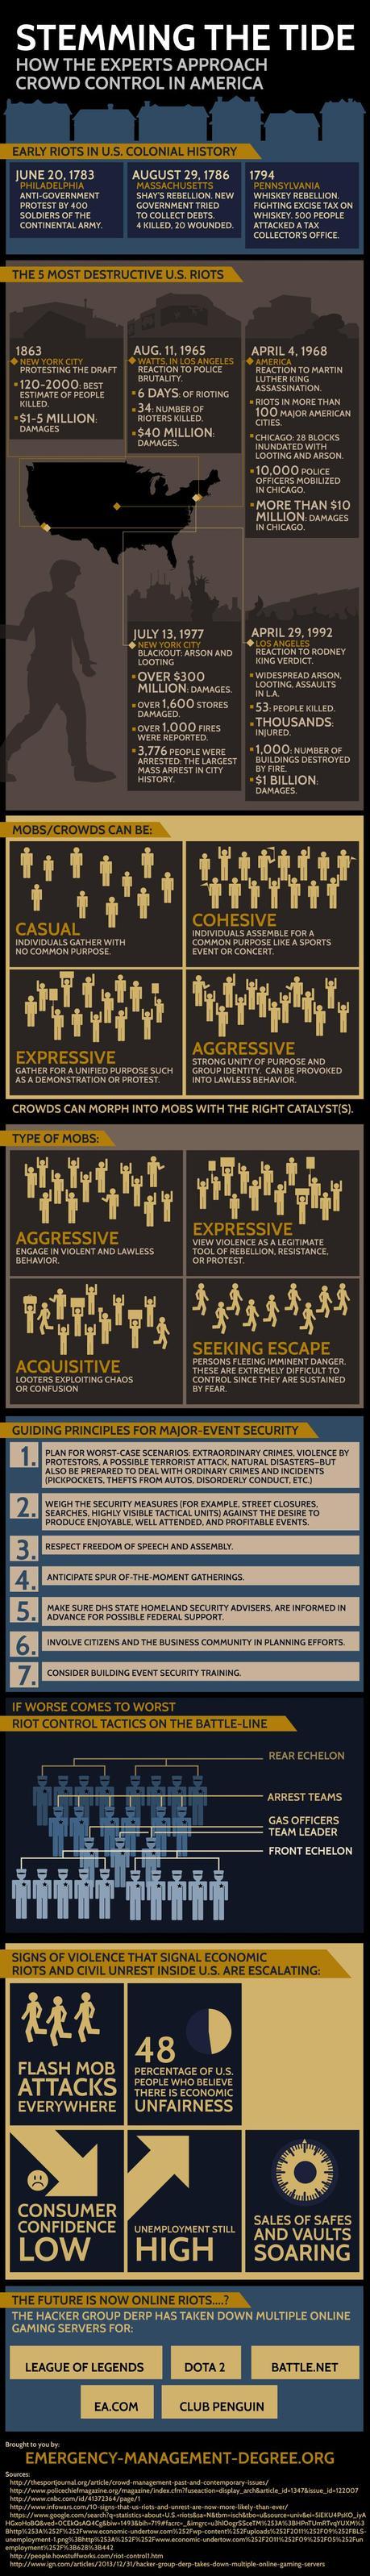 The US Private Prison System